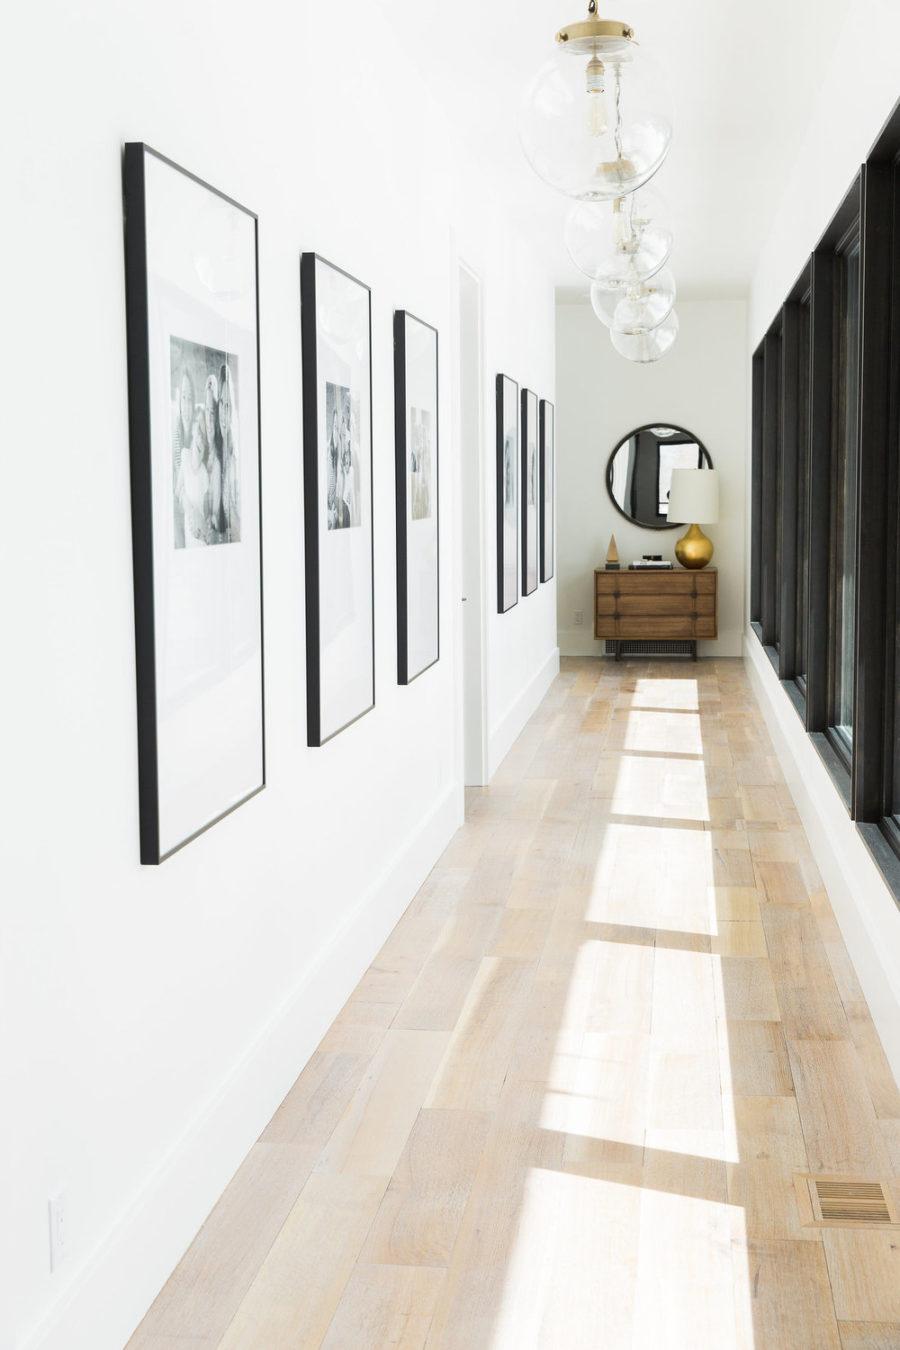 Portrait gallery hallway via Studio McGee